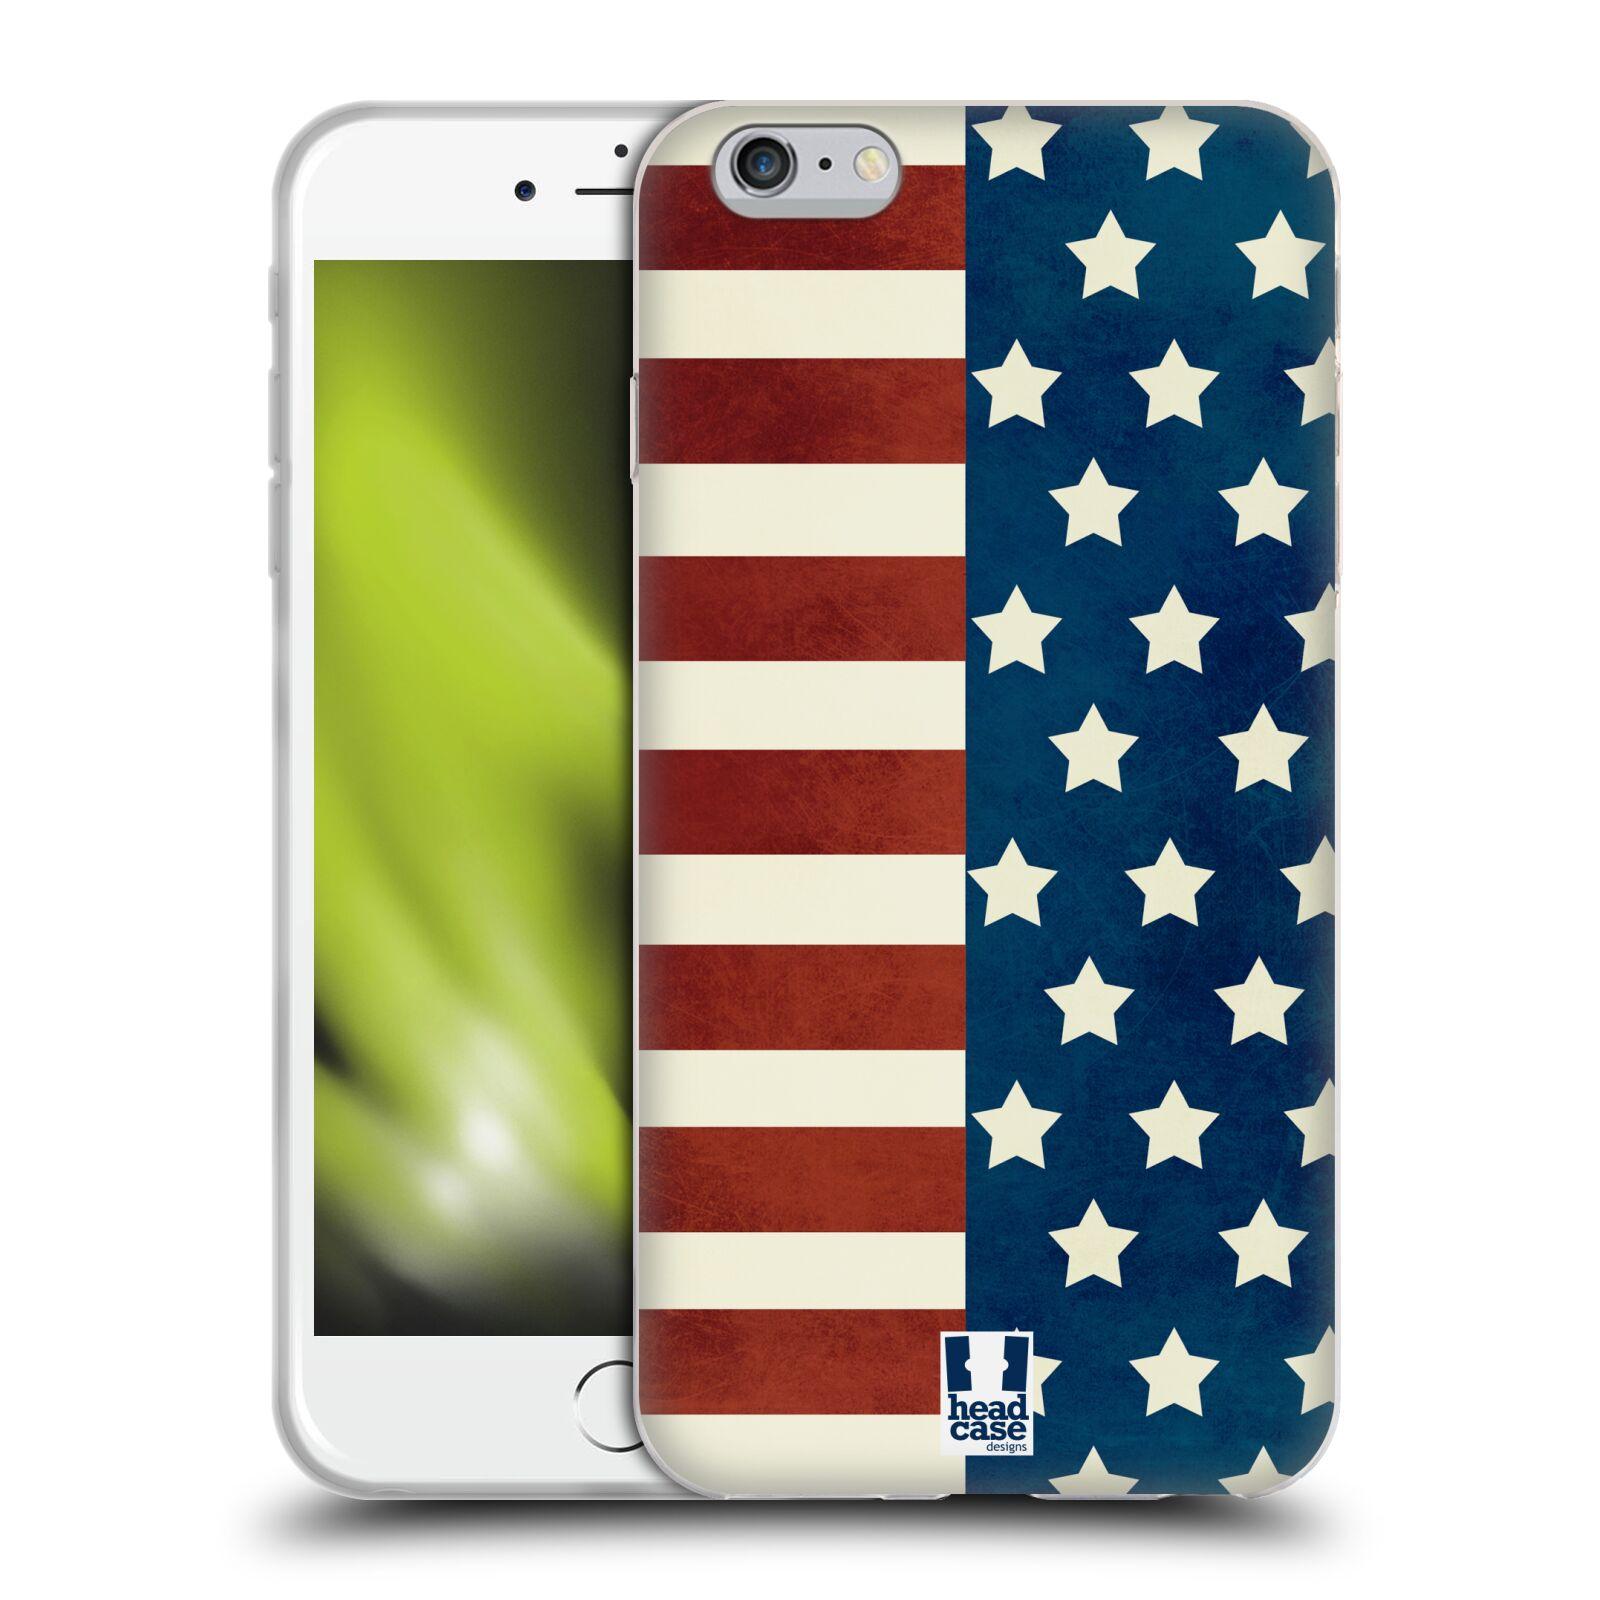 HEAD CASE silikonový obal na mobil Apple Iphone 6 PLUS/ 6S PLUS vzor USA VLAJKA HVĚZDY A PRUHY